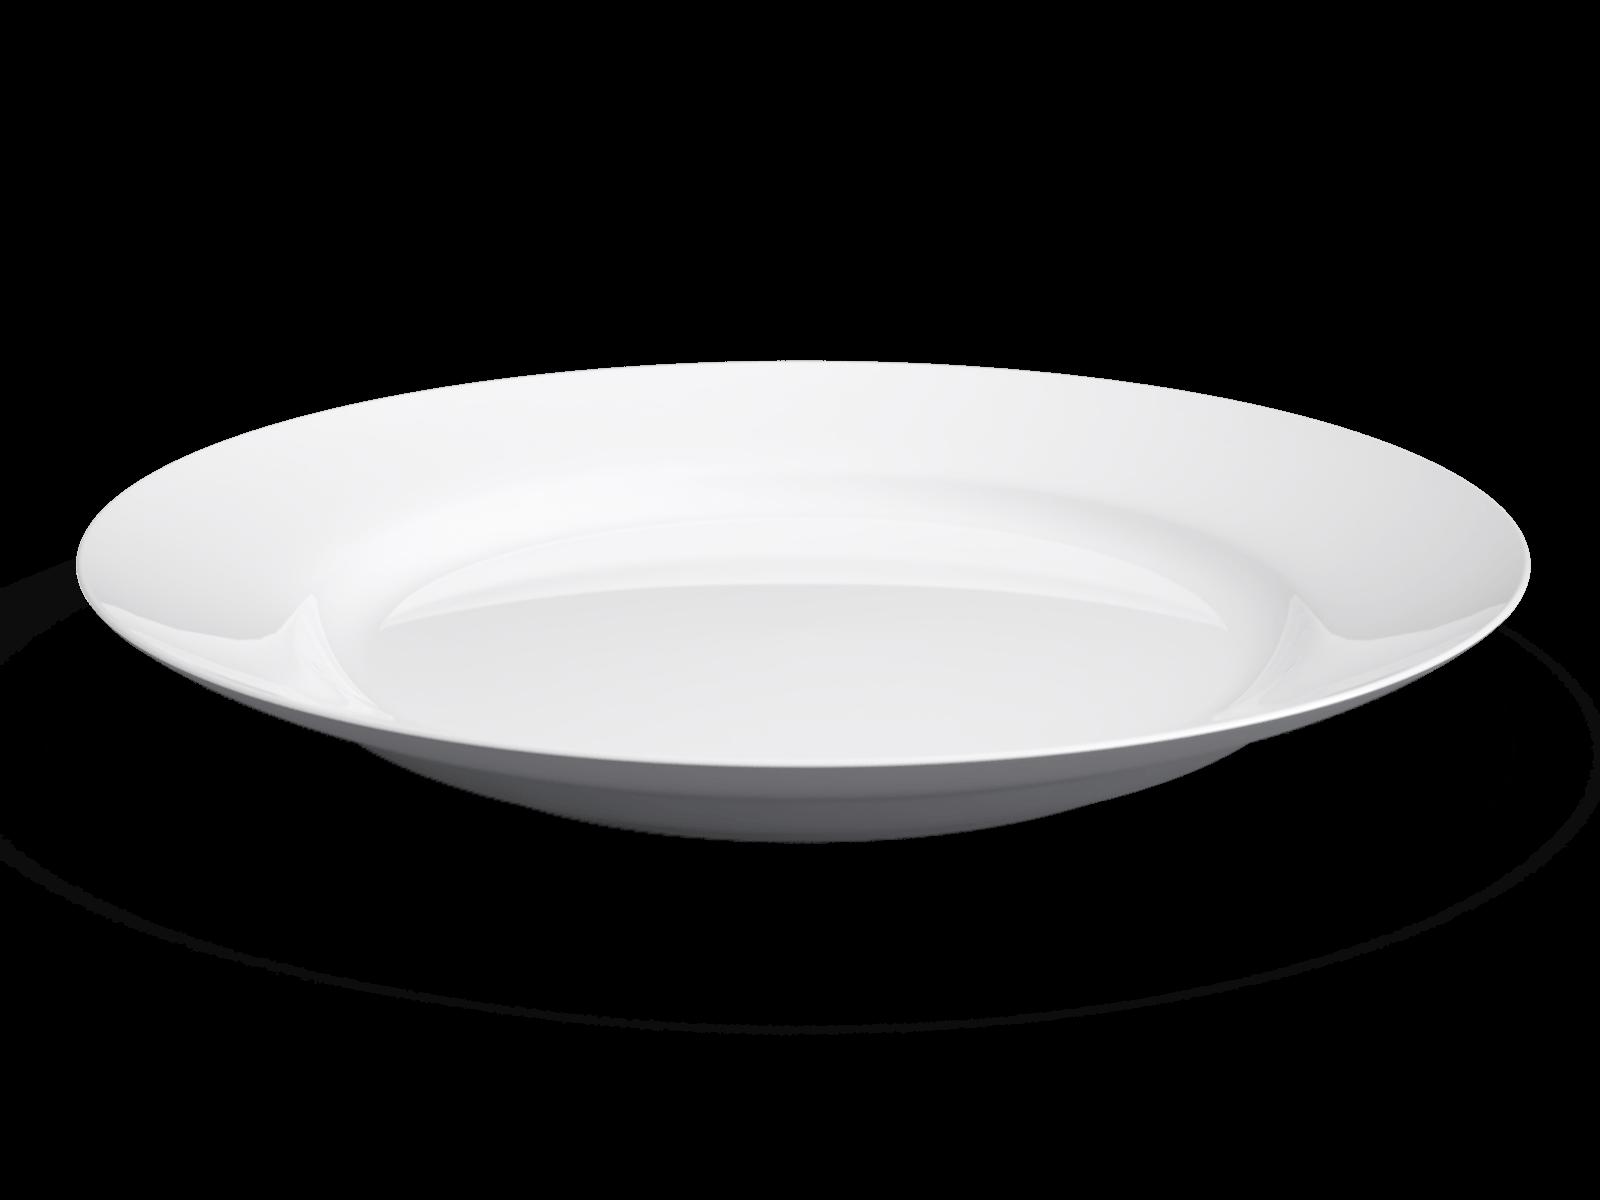 White Plate Transparent PNG SVG Clip arts